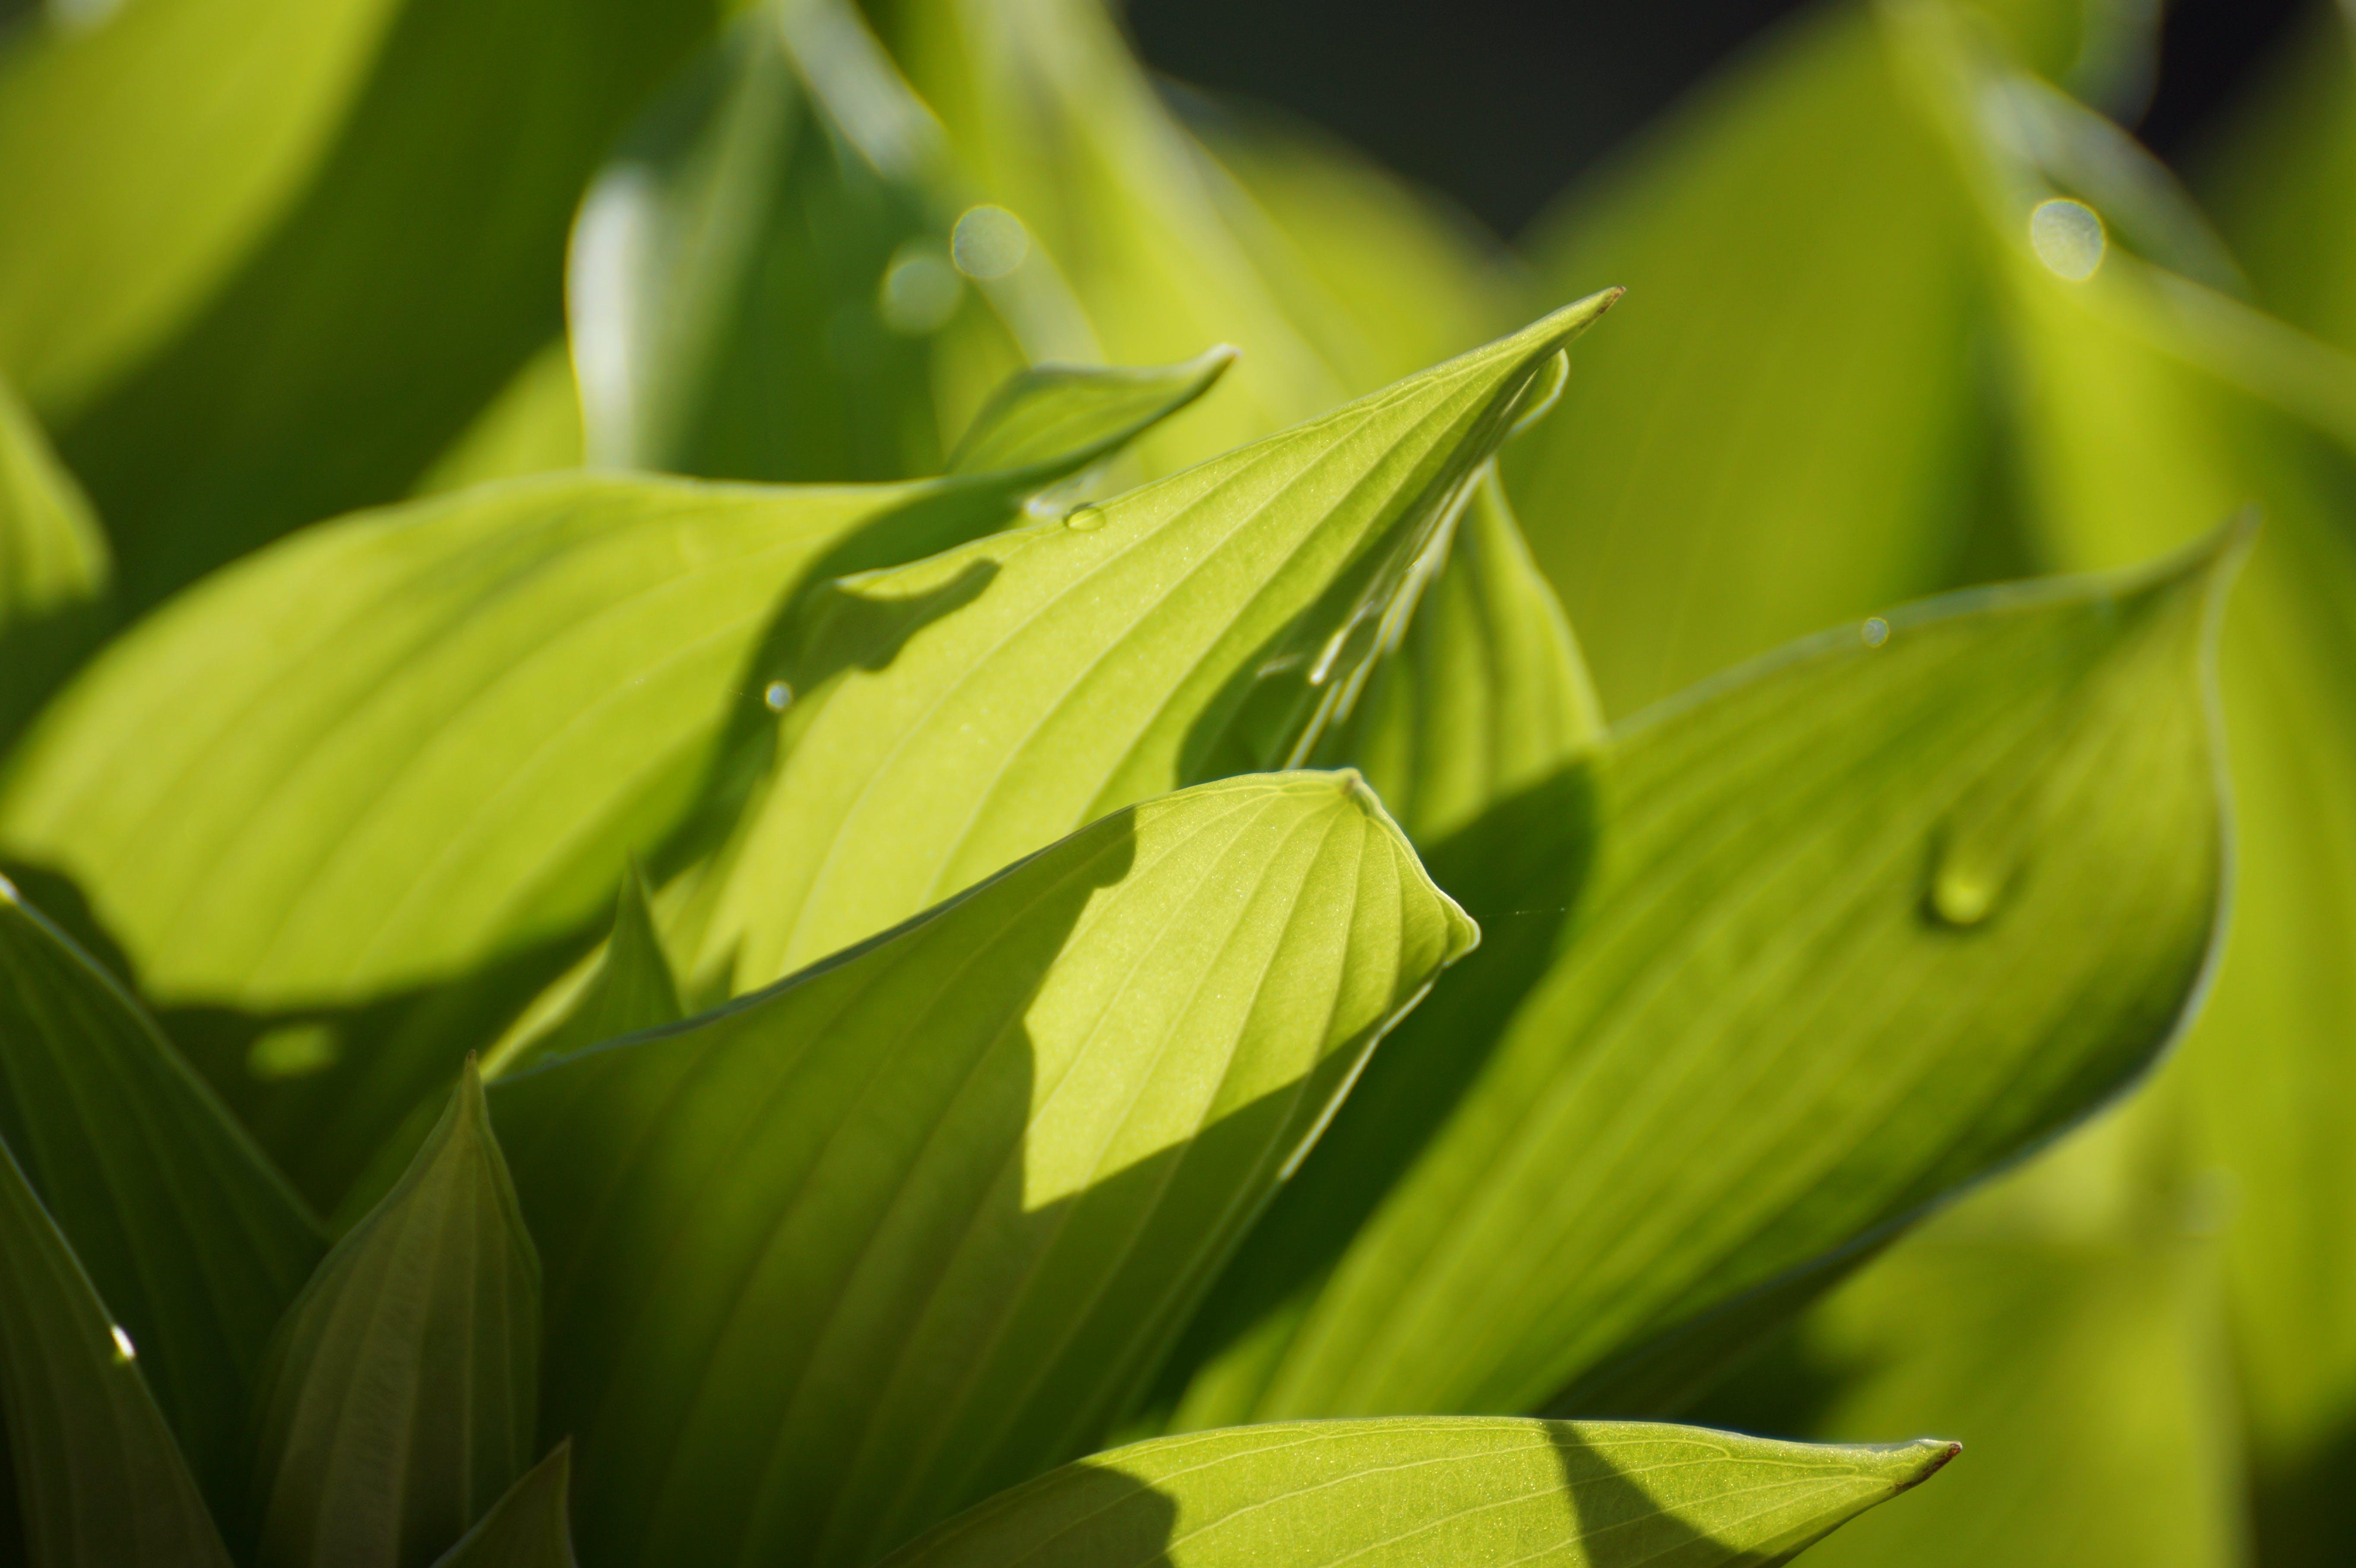 Kostenloses Stock Foto zu blätter, grün, makro, nahansicht